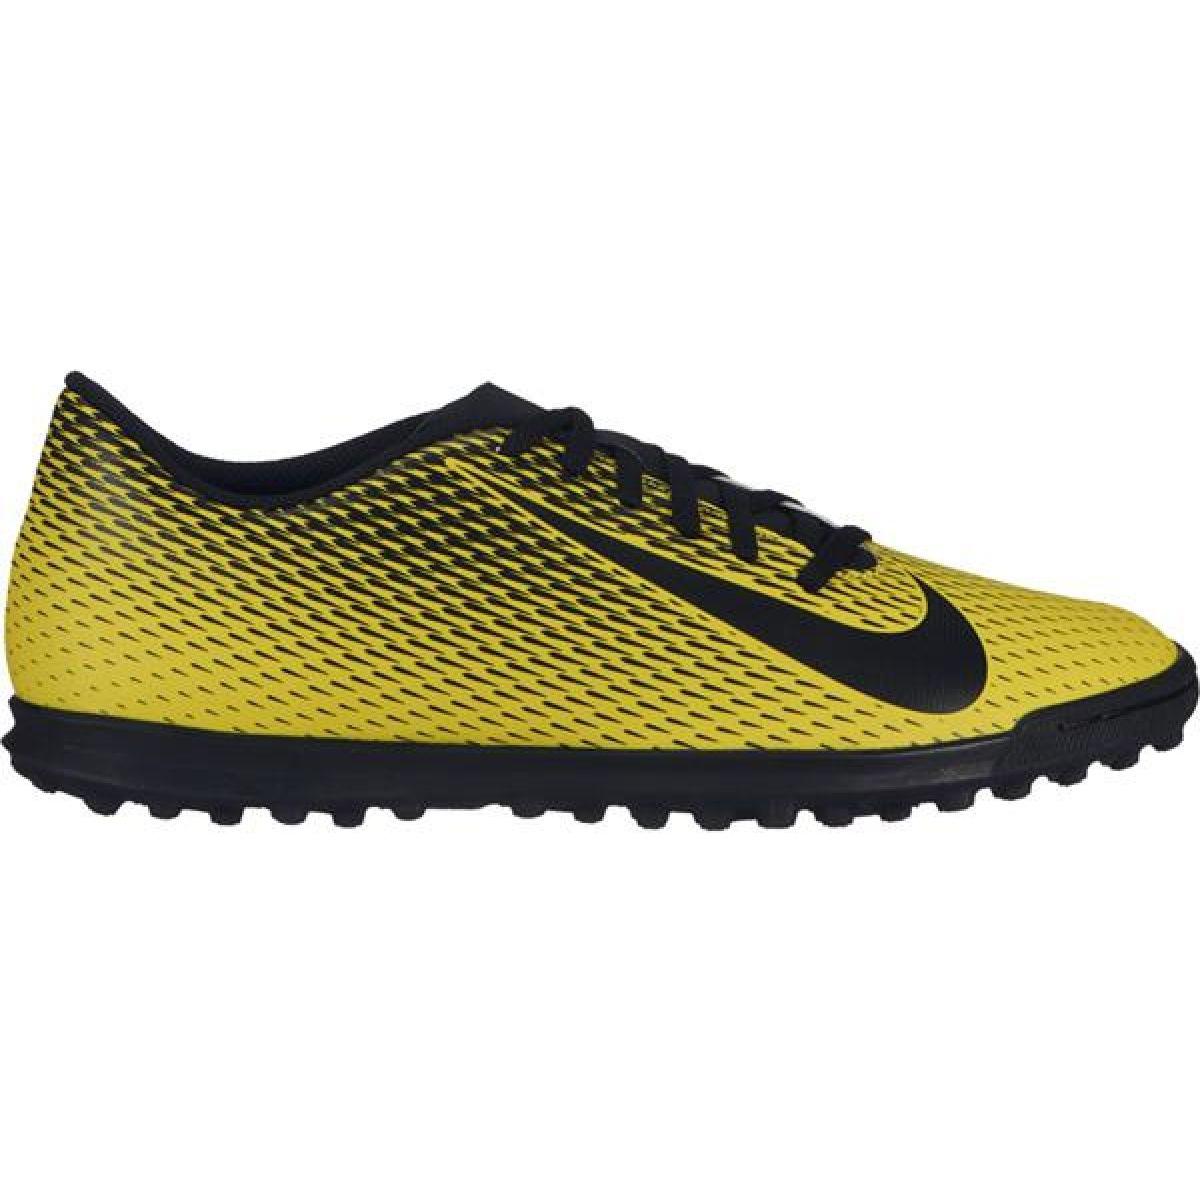 Zapatillas de fútbol Nike Bravatax Ii Tf M 844437 701 amarillo amarillo